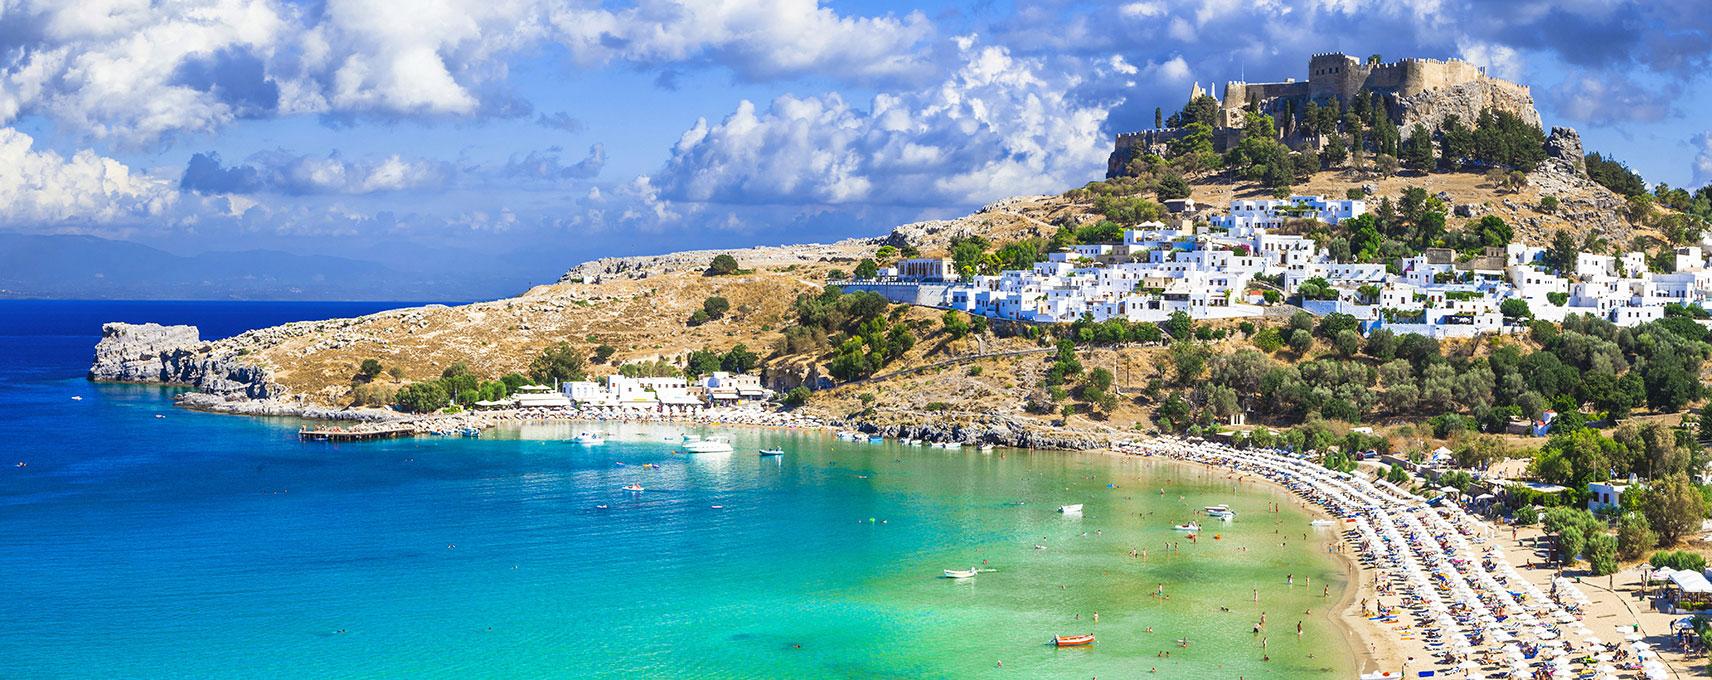 Castles On Rhodes Island Greece